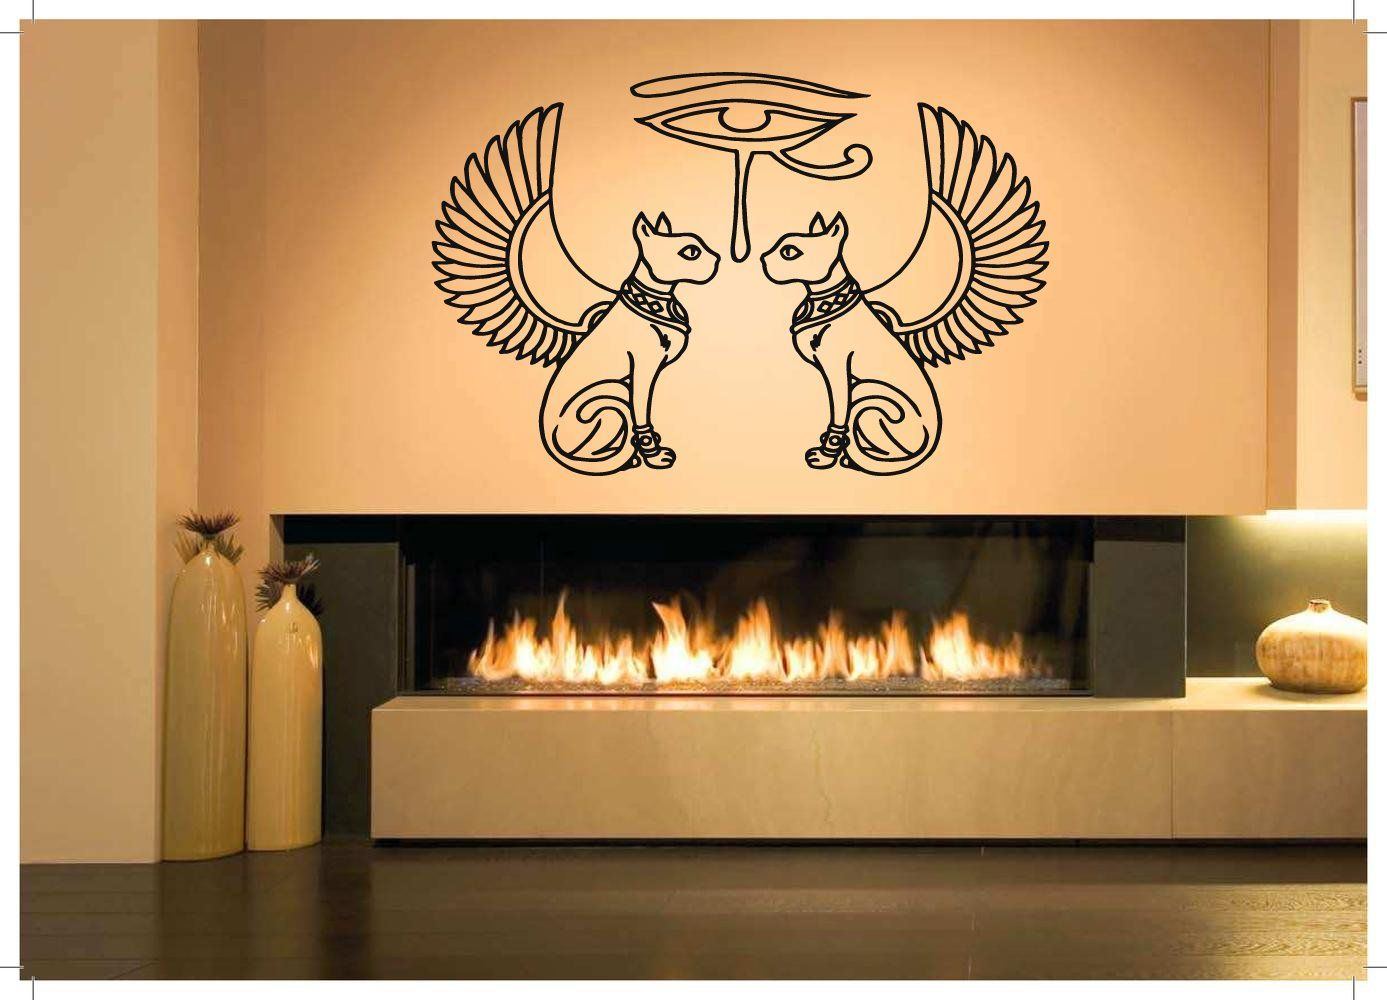 Wall Room Decor Art Vinyl Sticker Mural Decal Egypt Cats Eye Ra Big ...